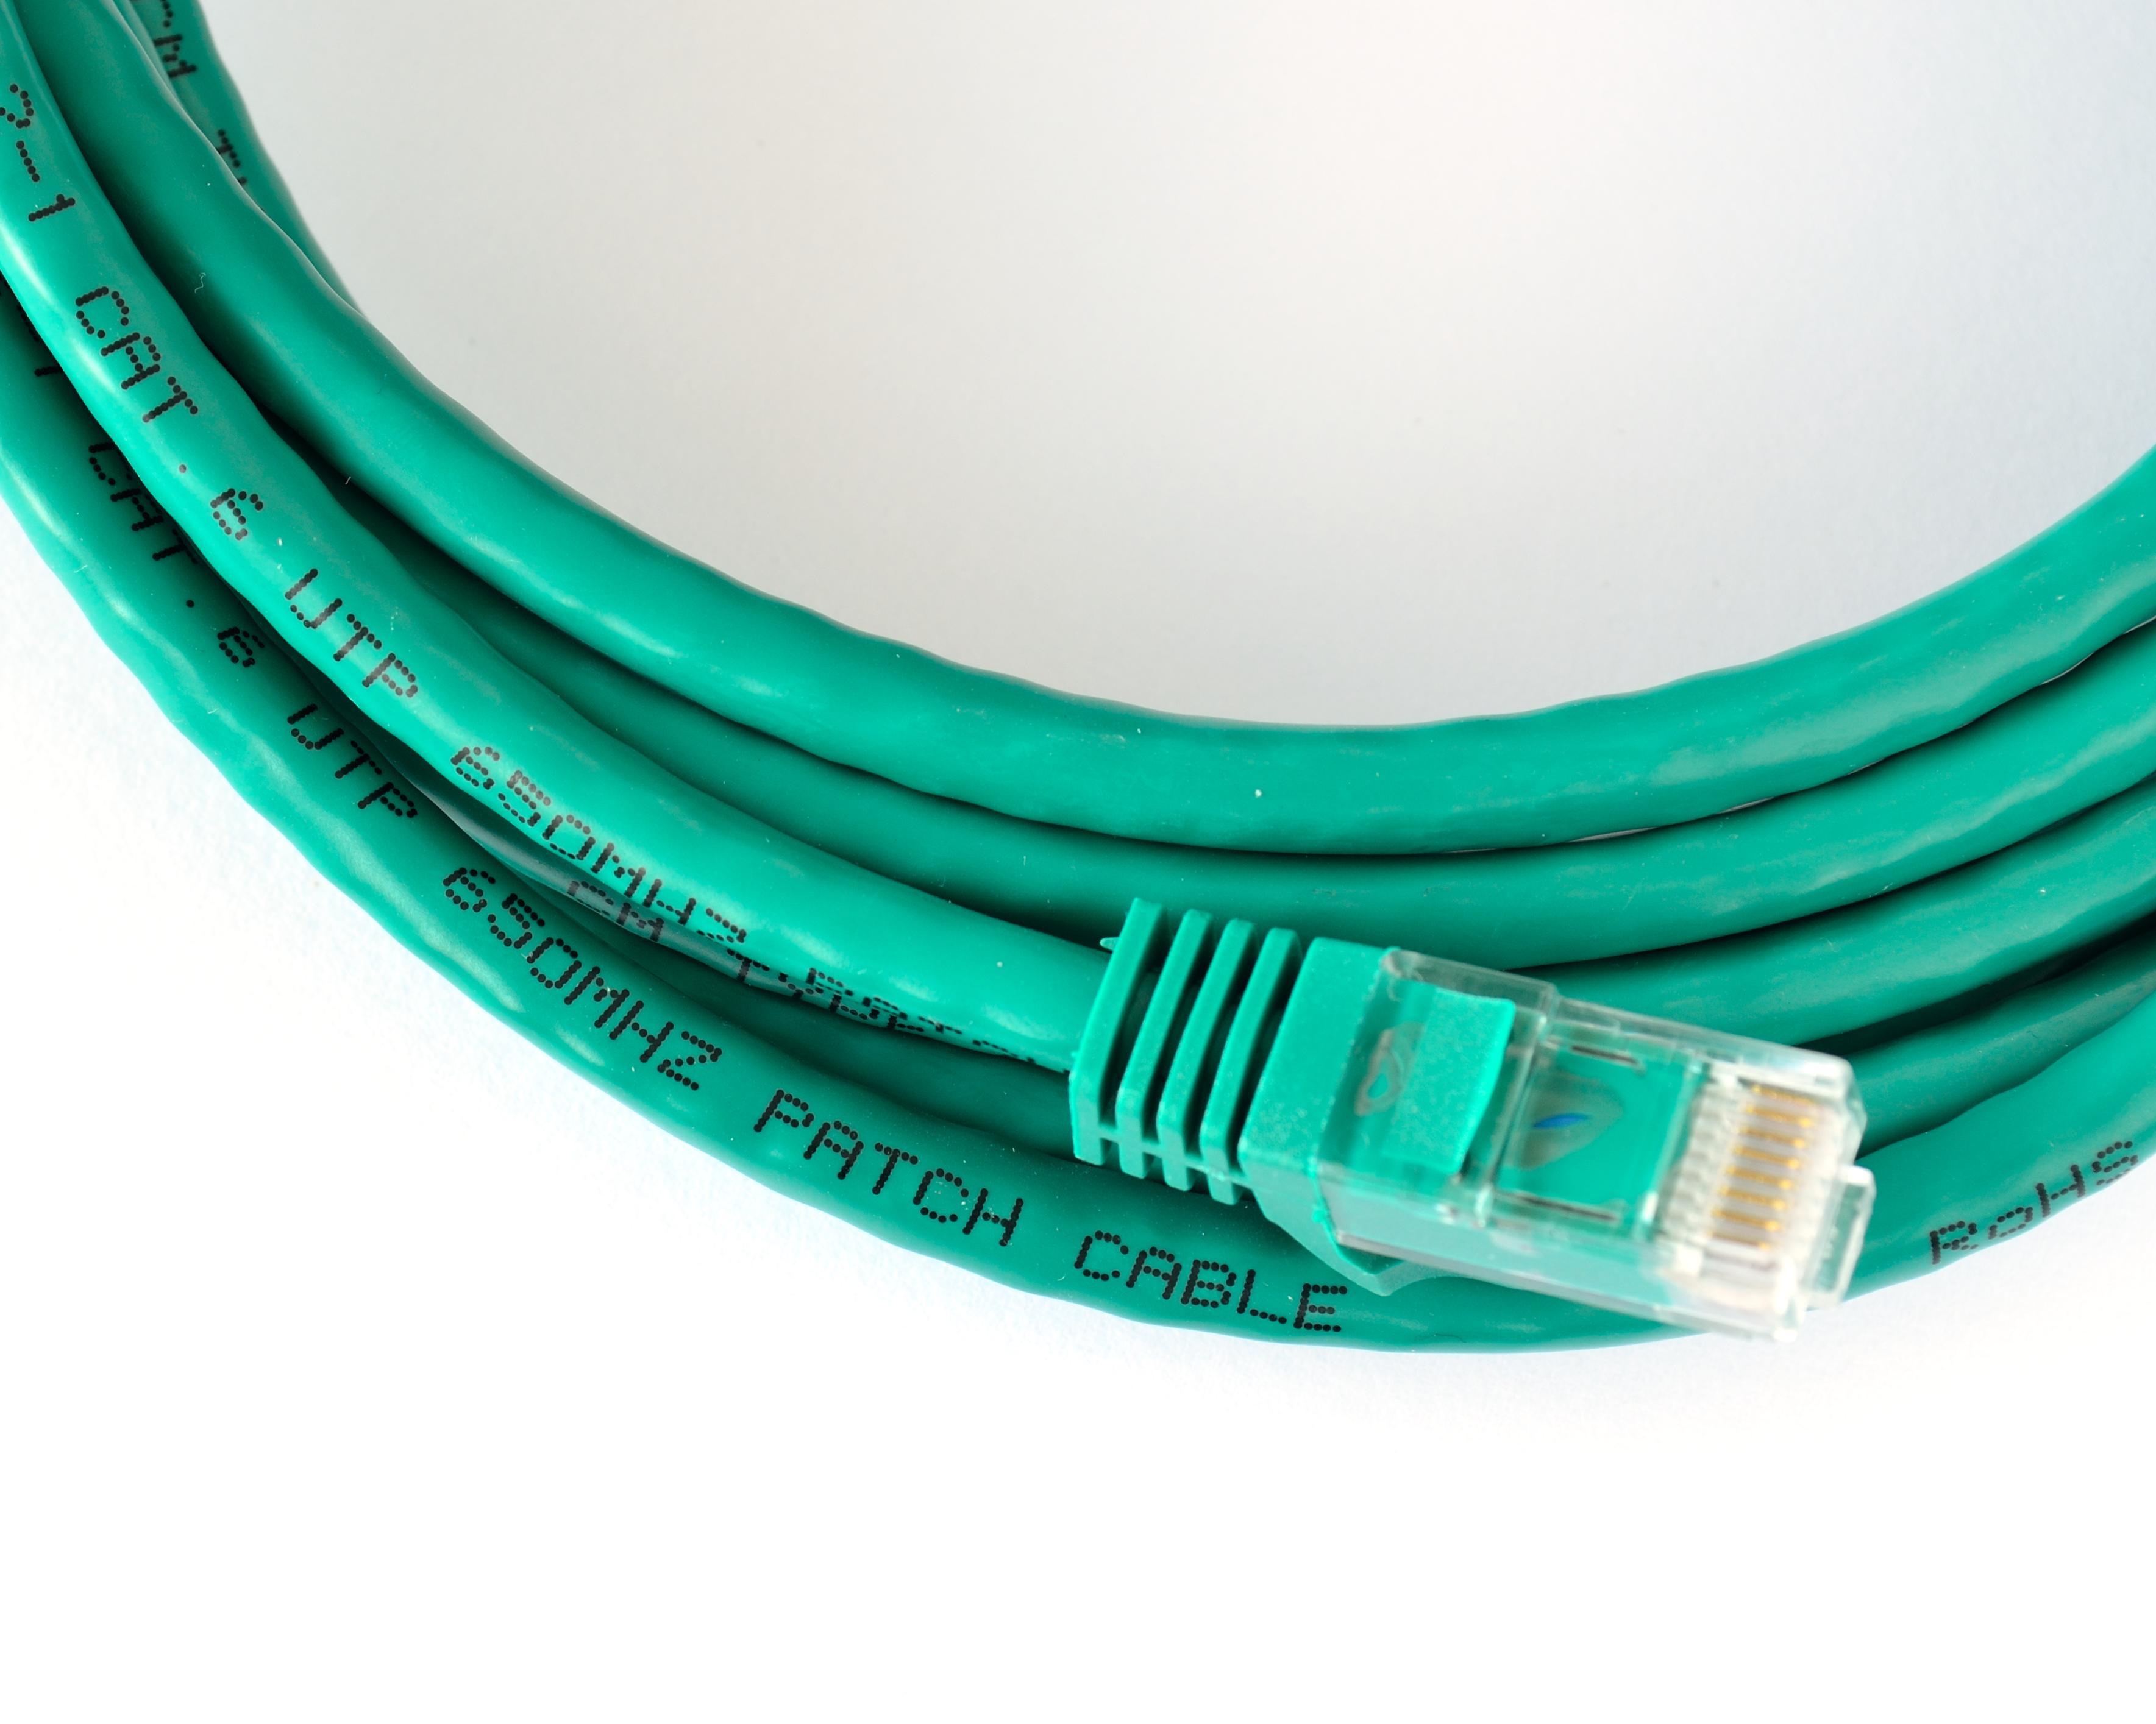 Strange Patch Cable Wikipedia Wiring Cloud Ittabpendurdonanfuldomelitekicepsianuembamohammedshrineorg